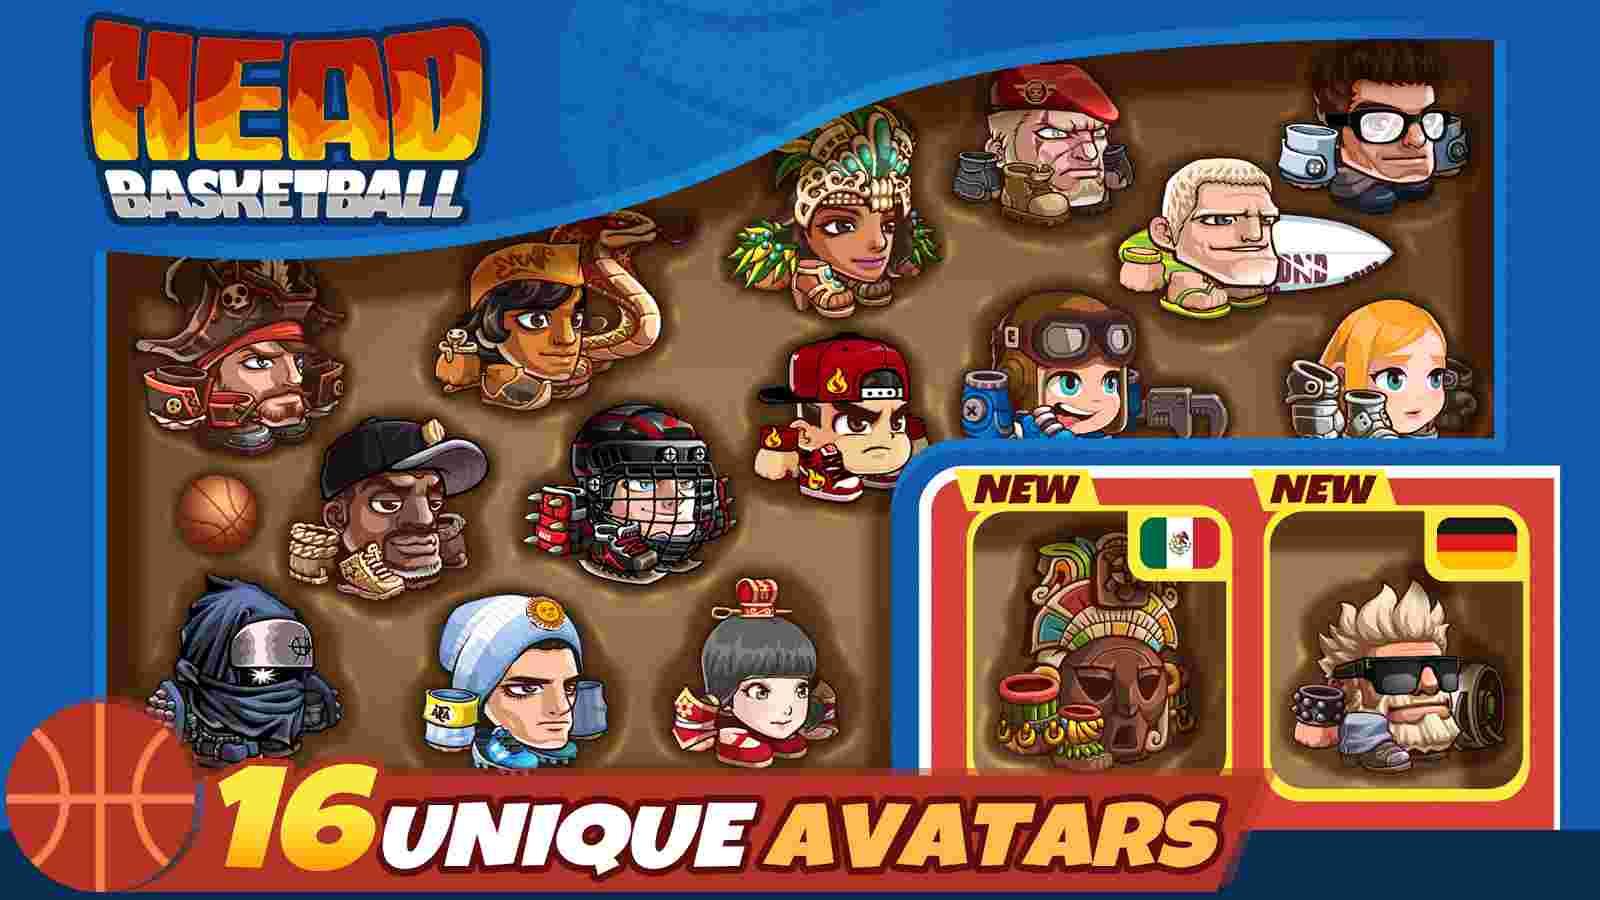 game Head Basketball mod apk